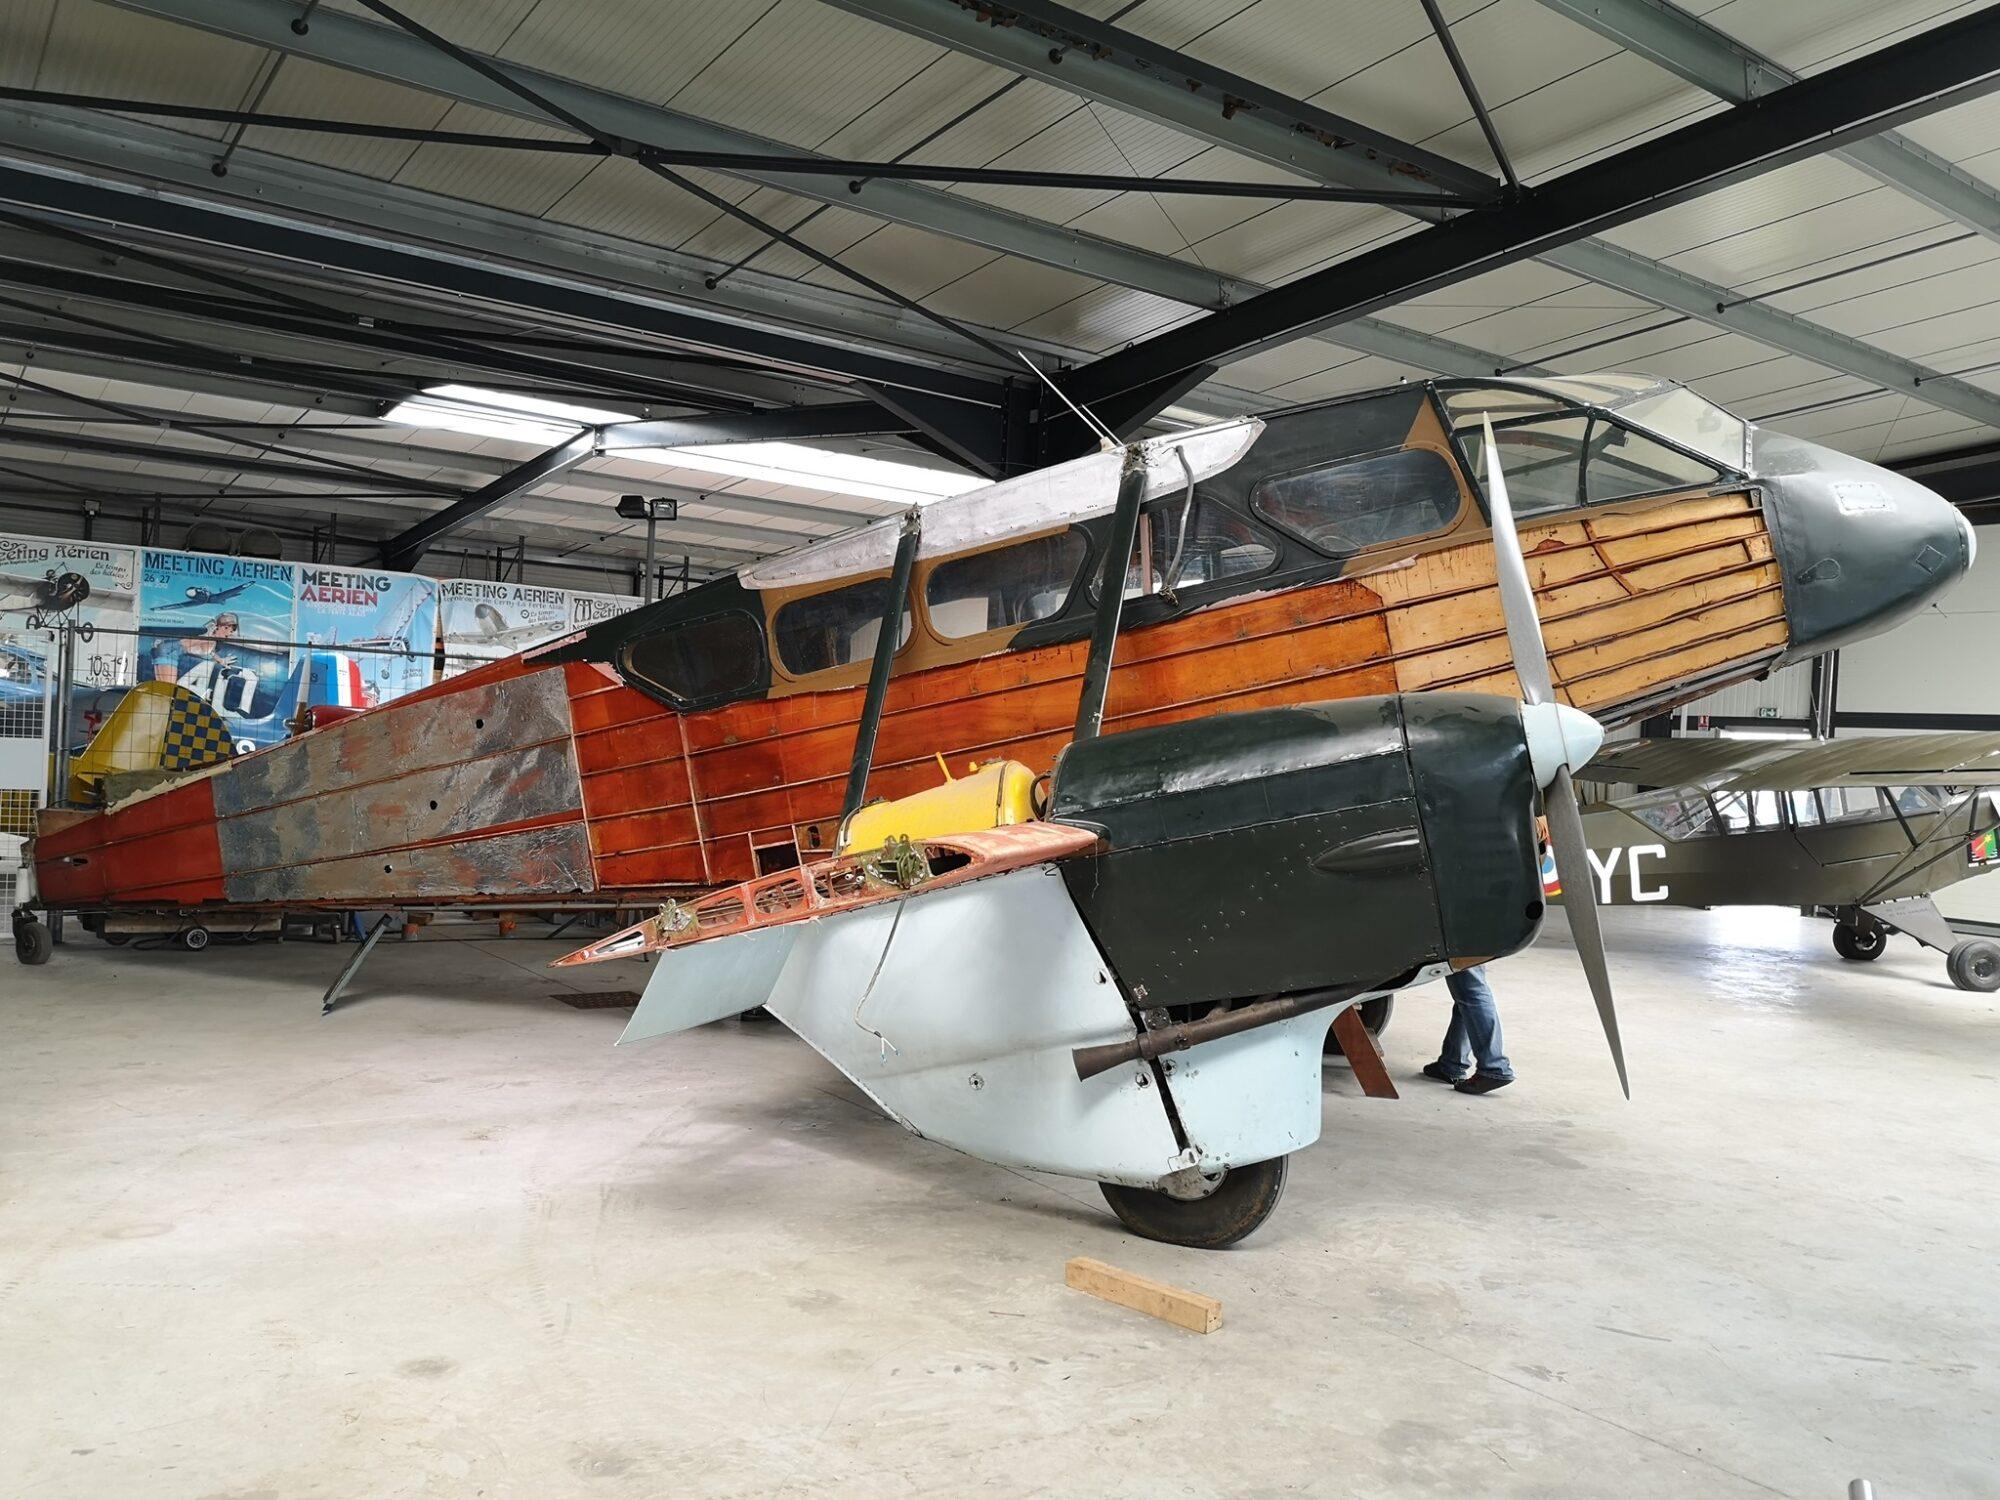 De Havilland DH.89A Dragon Rapide F-AZCA (Photo © Bernard Charles )